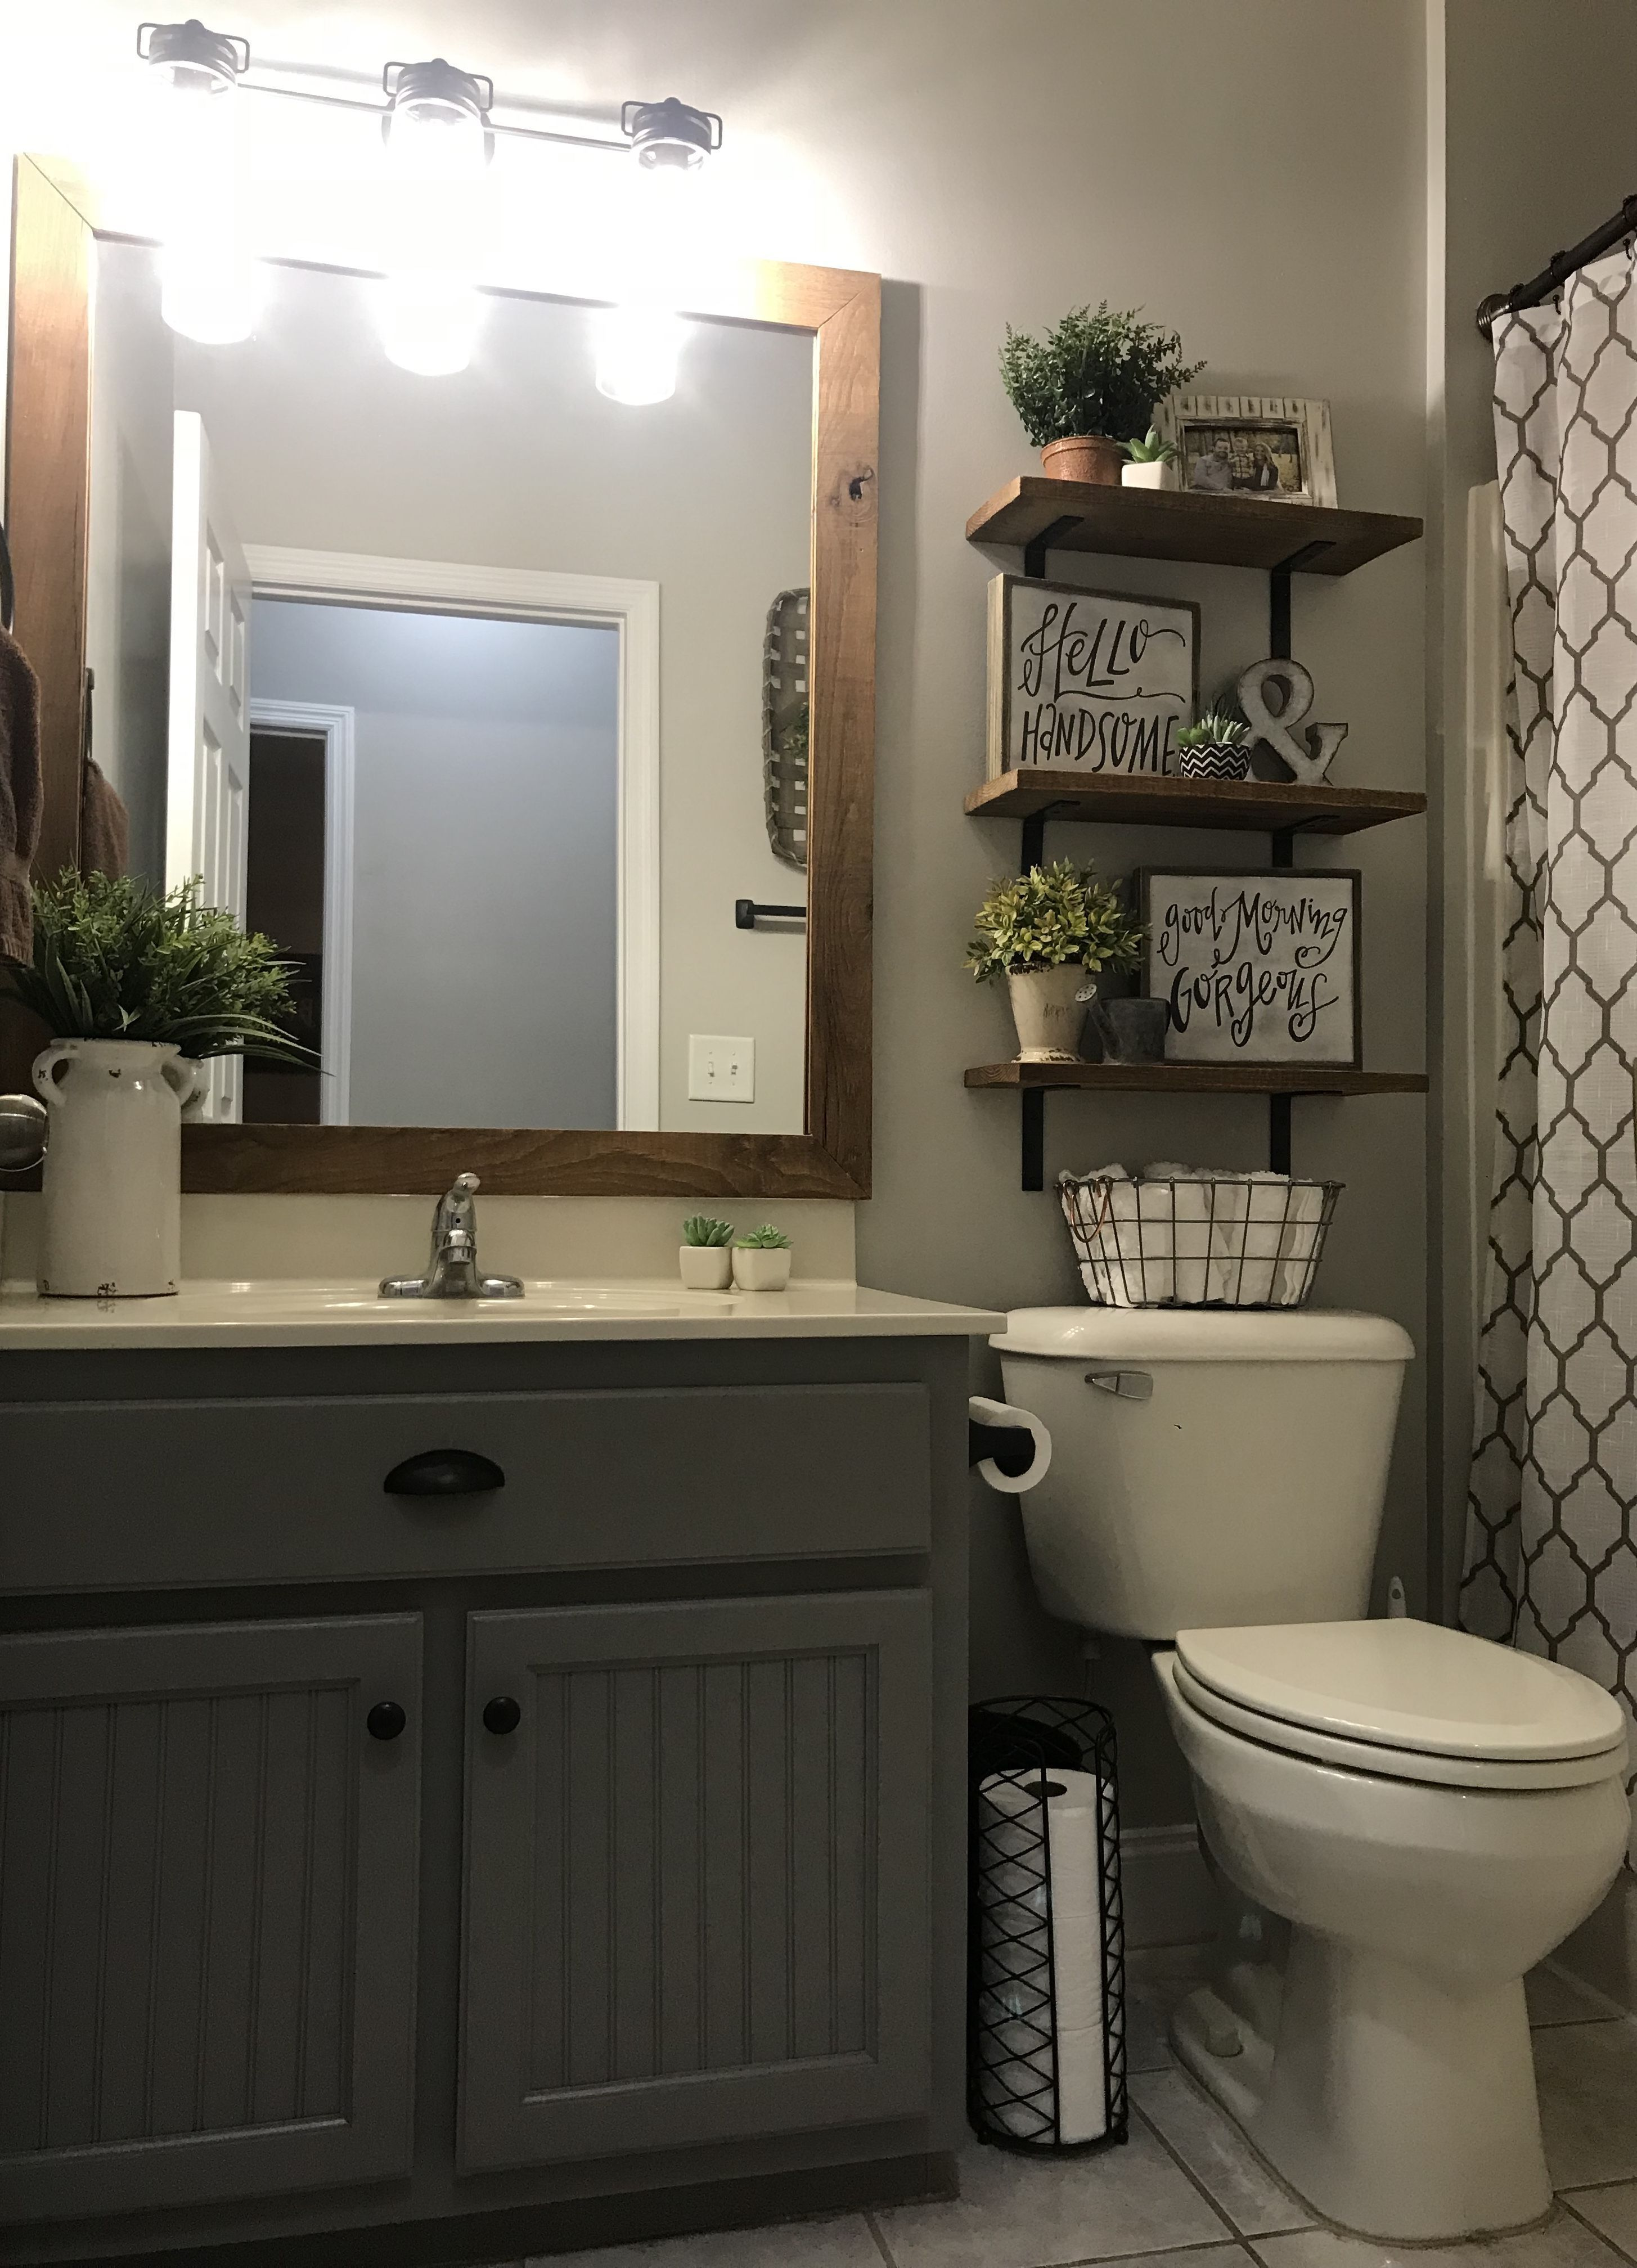 39 Best Rustic Farmhouse Bathroom Makeover Ideas images